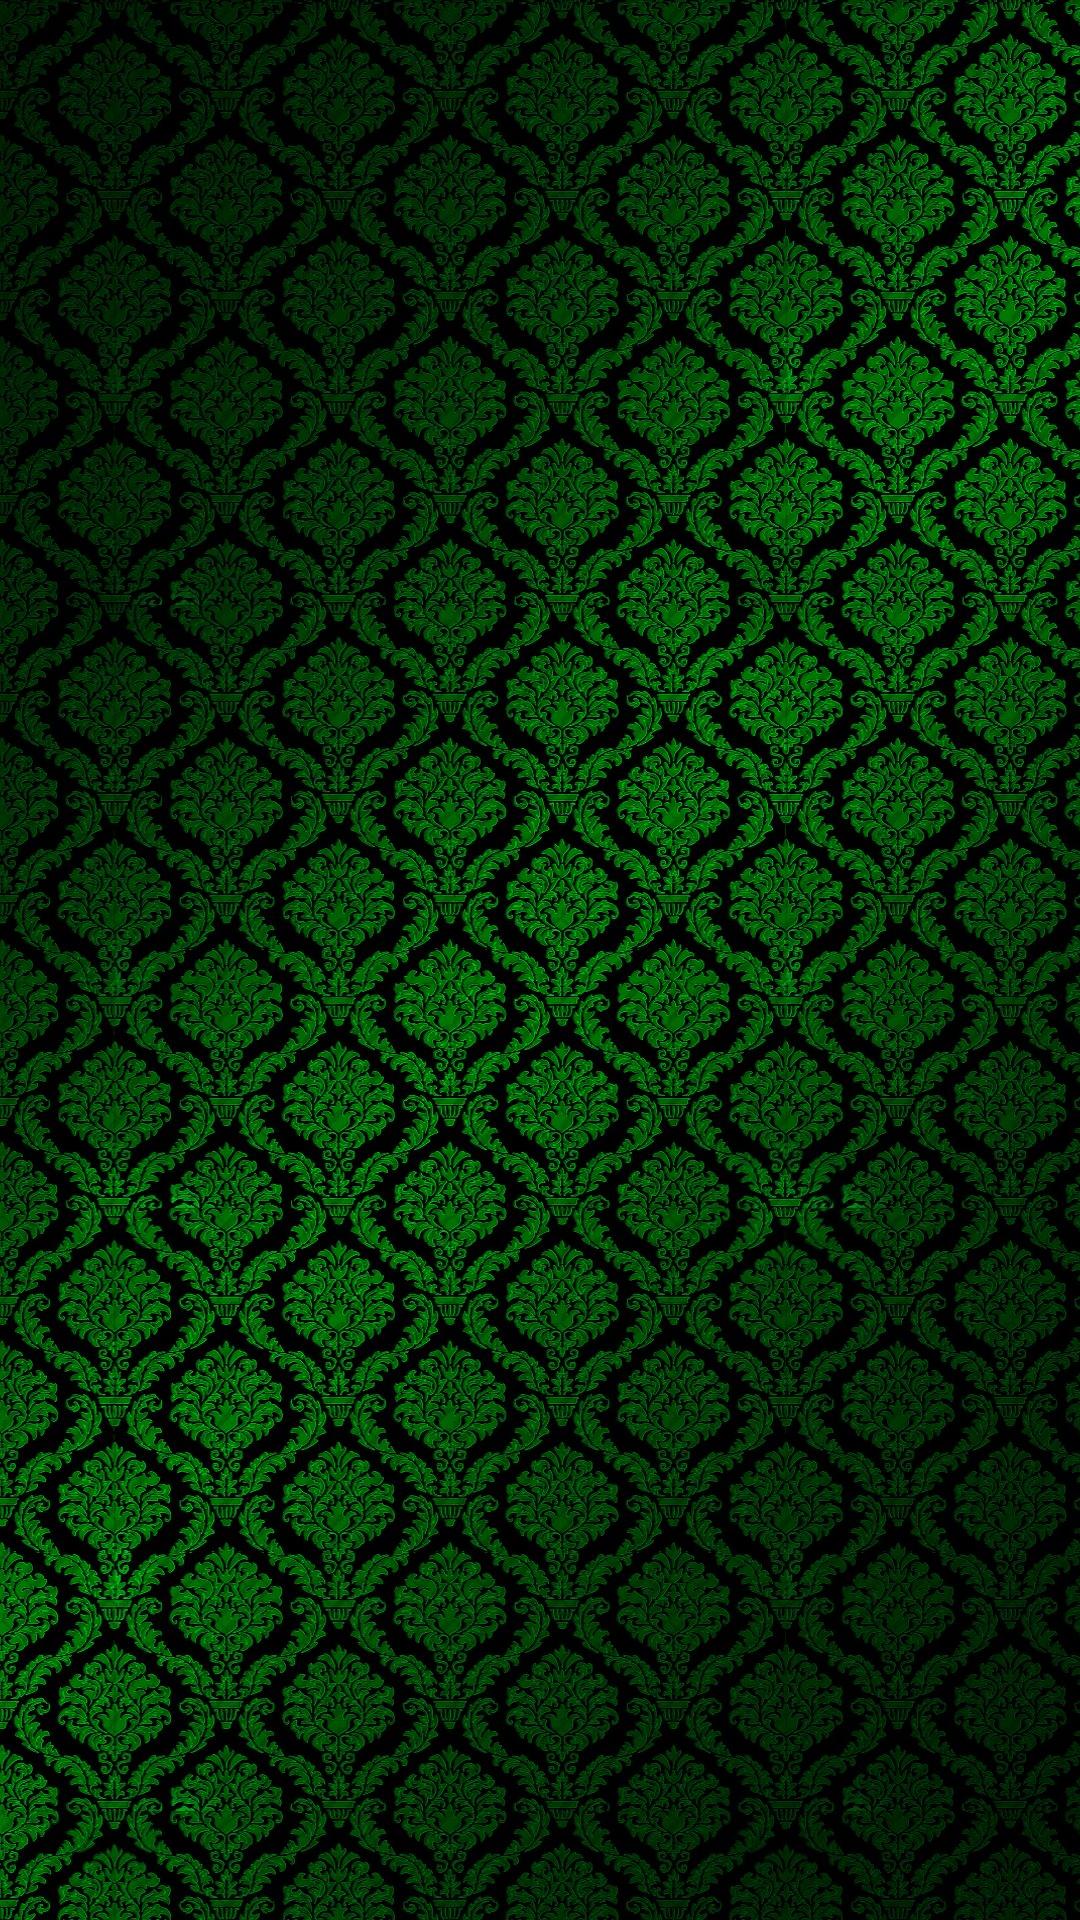 Cool green black wallpaper smartphone ablackcoolgreen android smart phone wallpaper voltagebd Choice Image